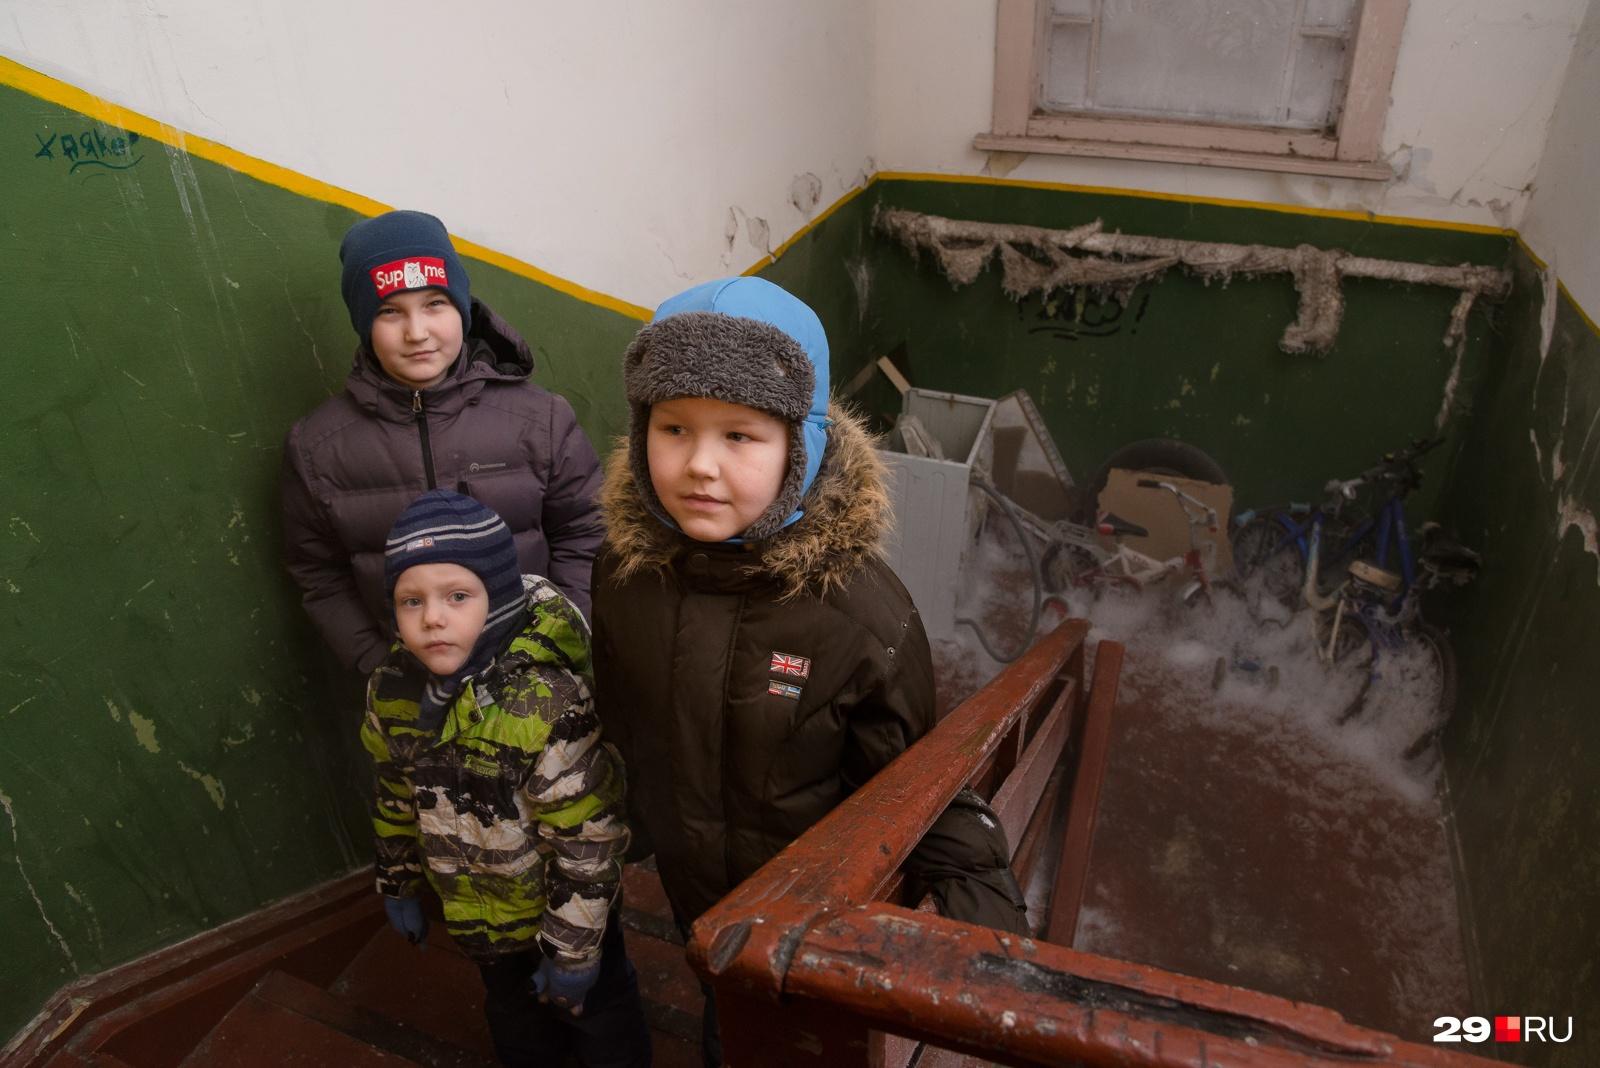 Слева — Вова, справа — Дима, а в центре самый маленький — Максим